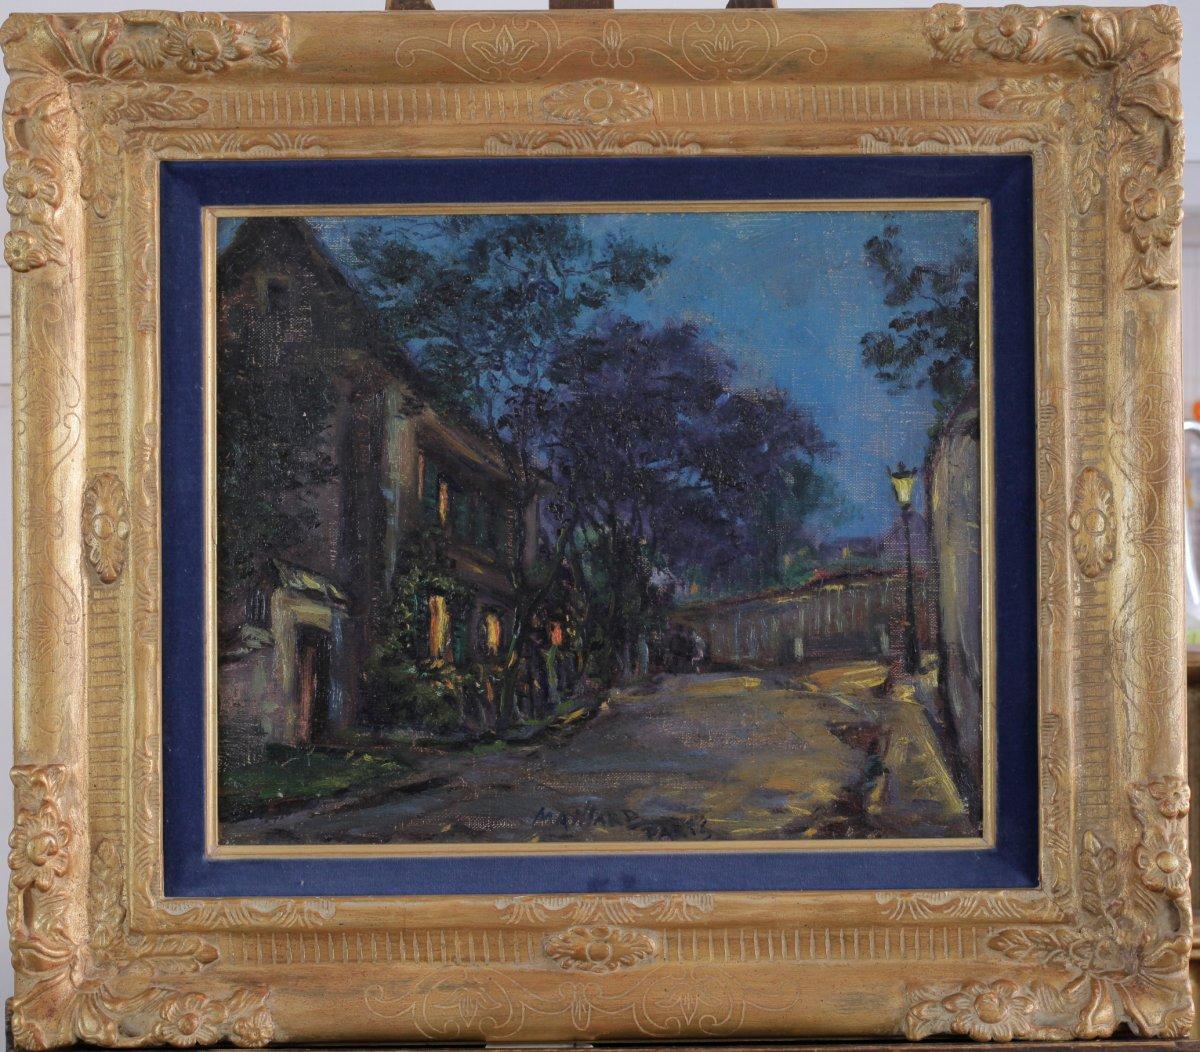 Jean Maillard, 1901, Paris, Montmartre, Cabaret Au Lapin Agile, Nighttime Atmosphere